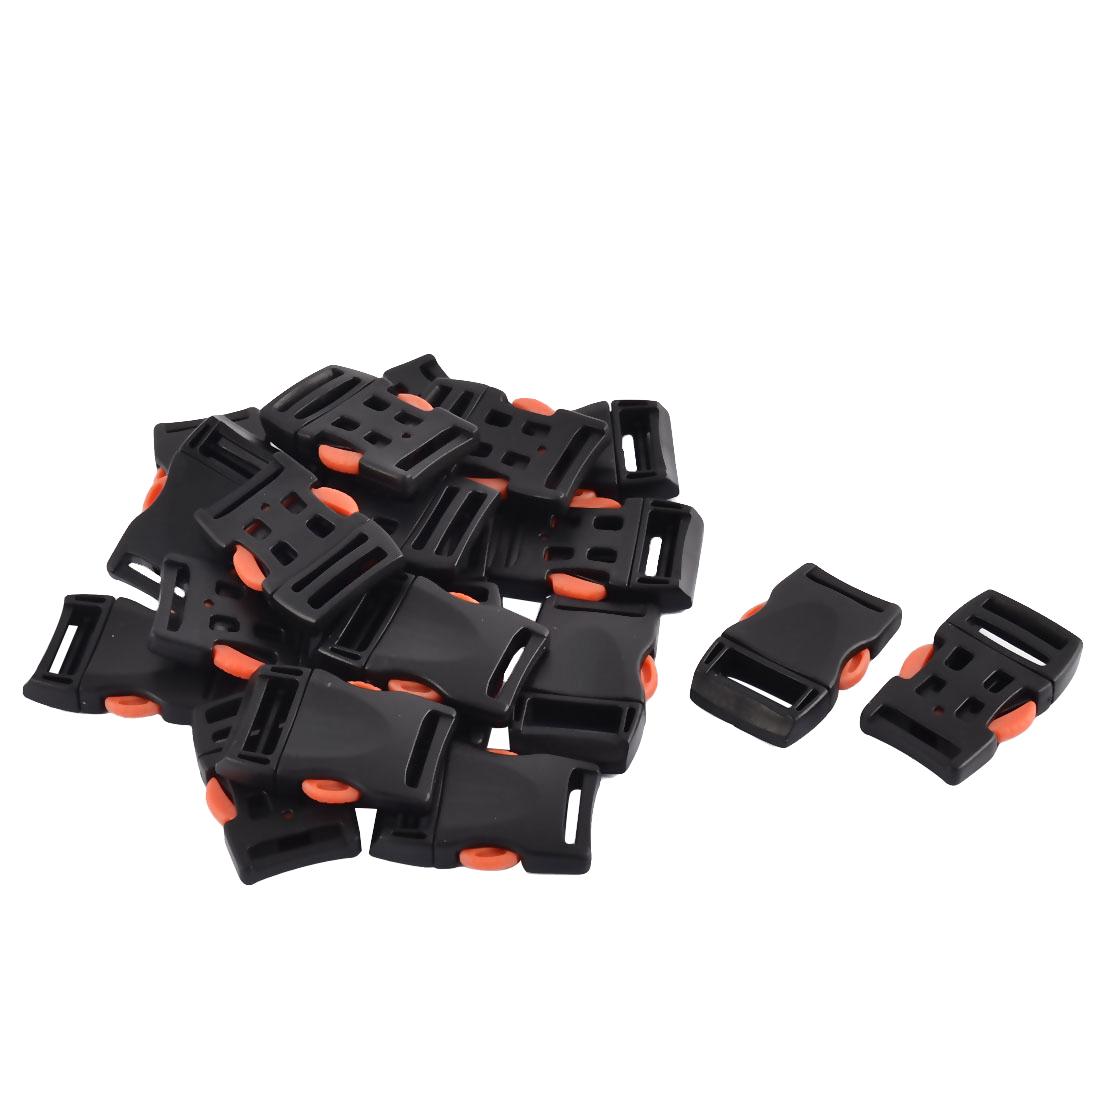 Handbag Plastic Side Quick Release Buckles 10mm Webbing Slot Black Orange 20Pcs